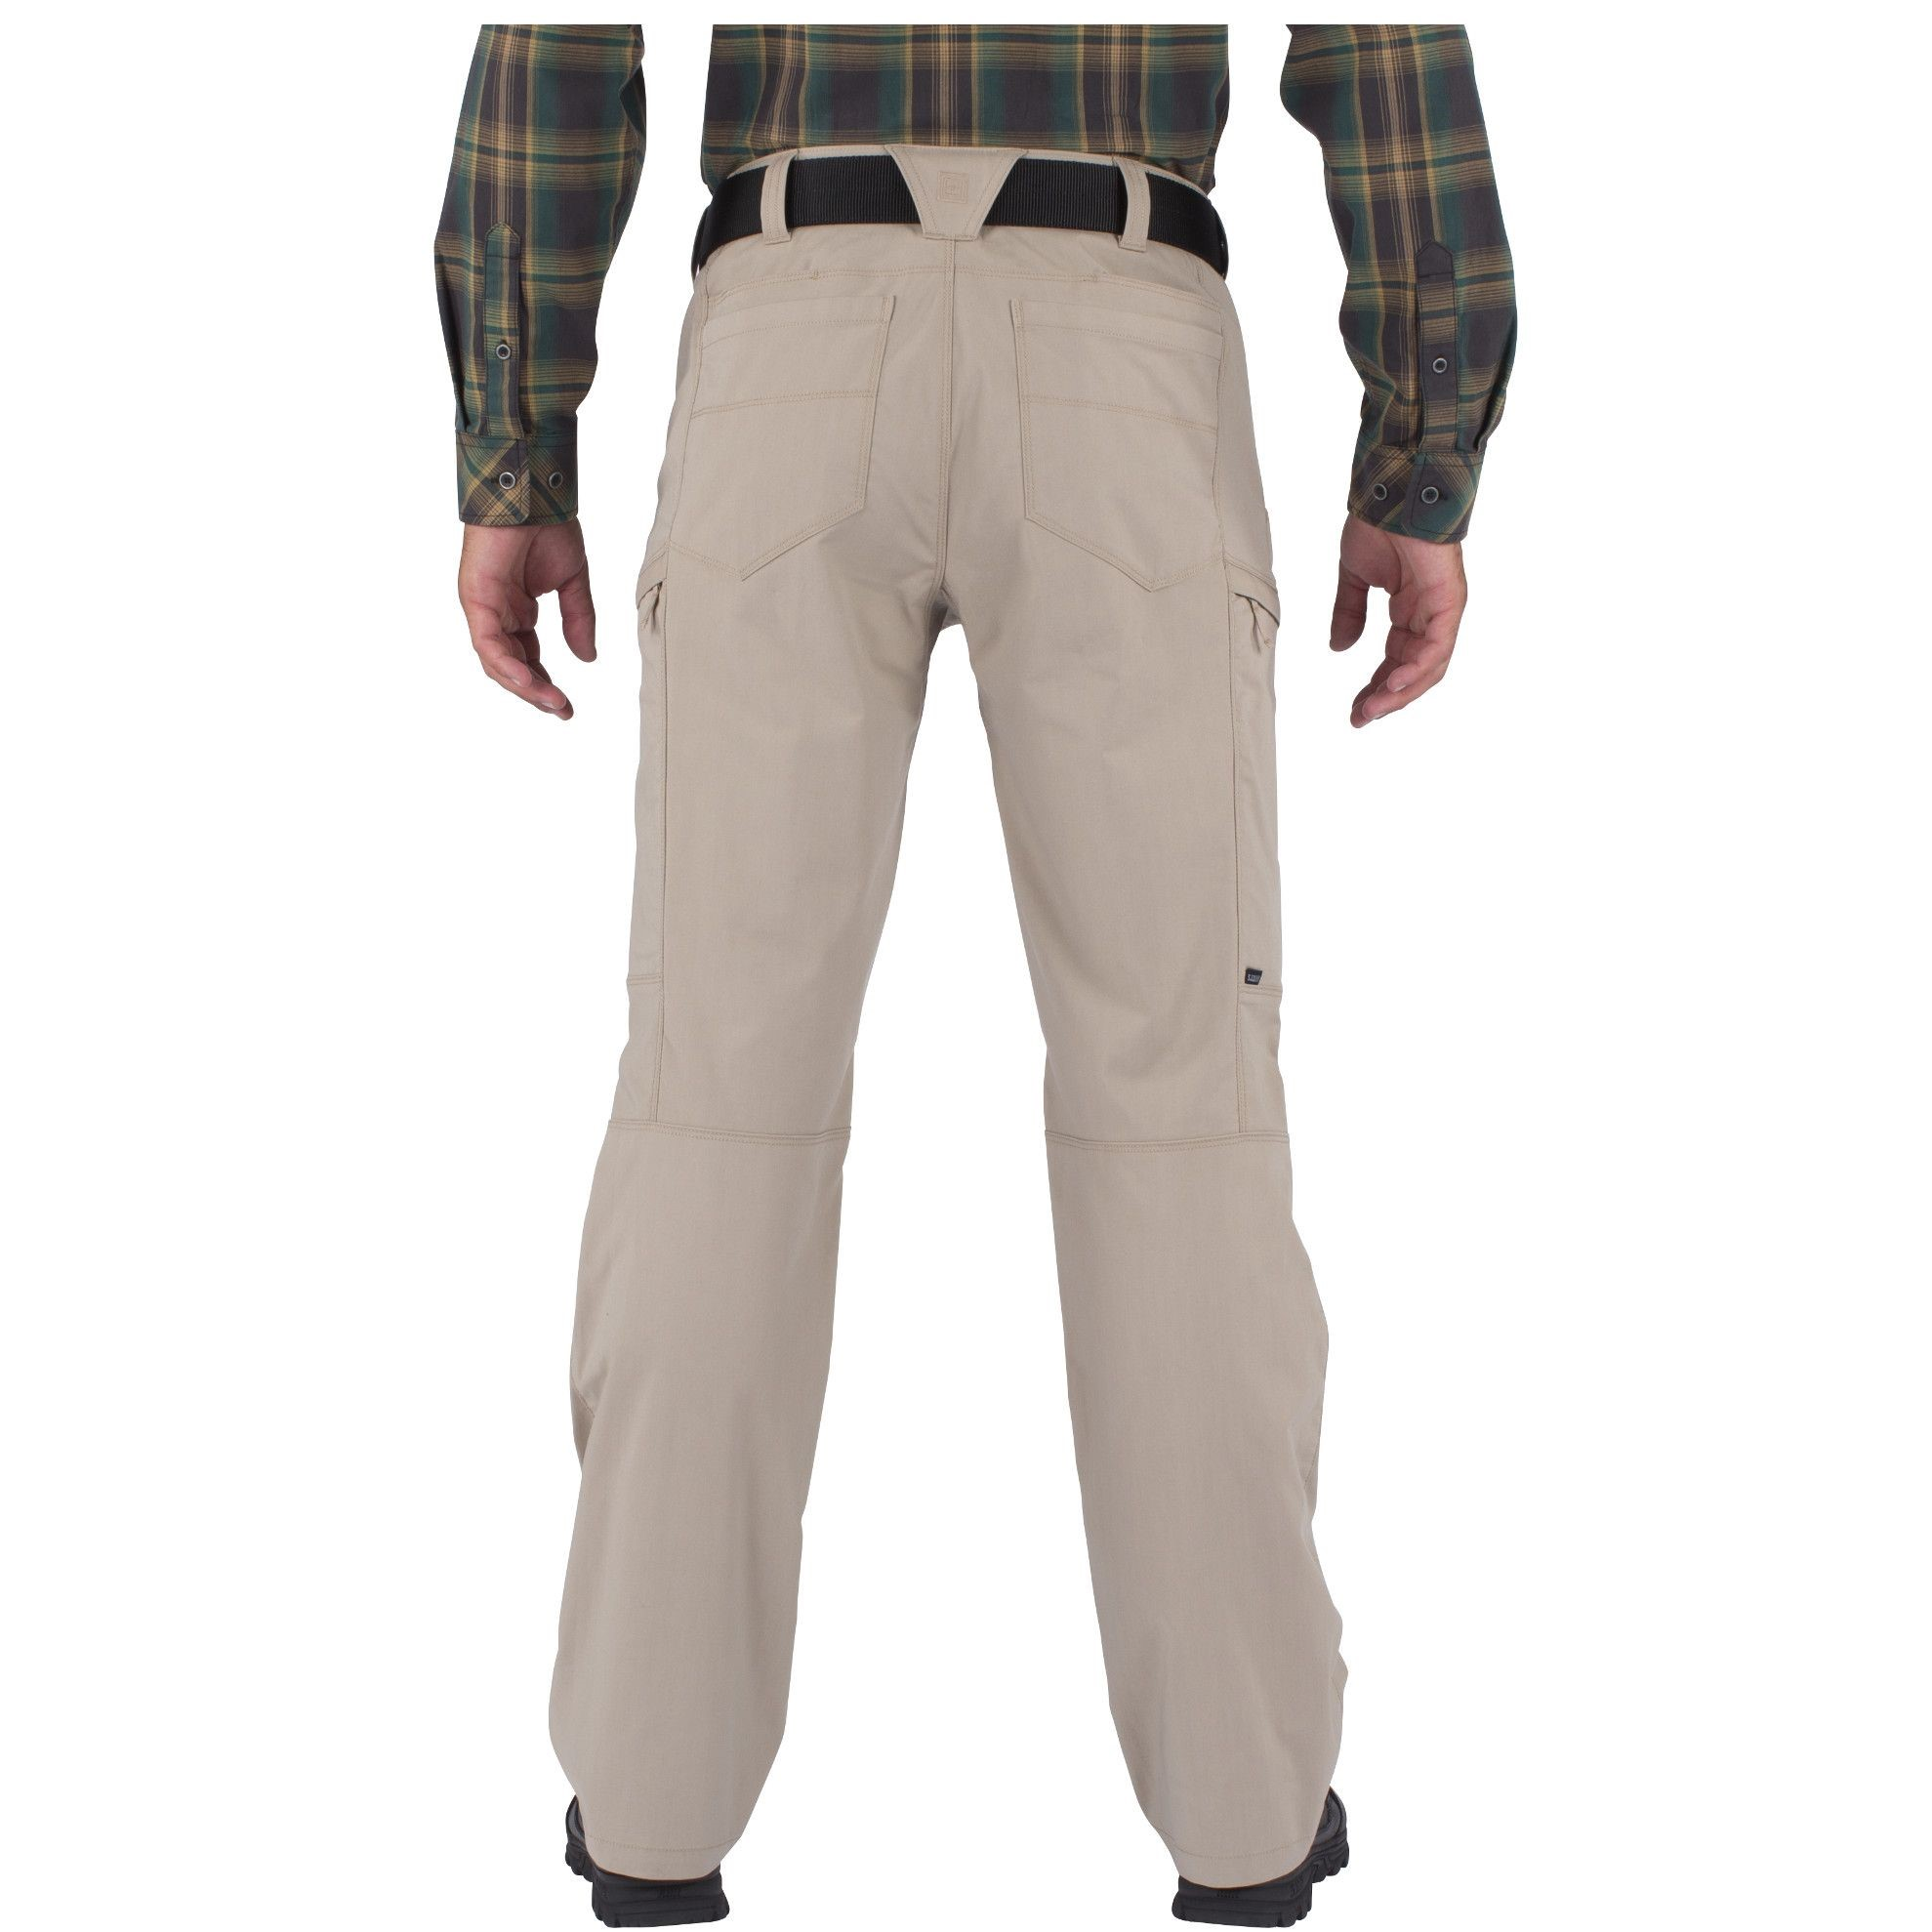 5.11 Apex Bukser Stræk bukser med mange lommer